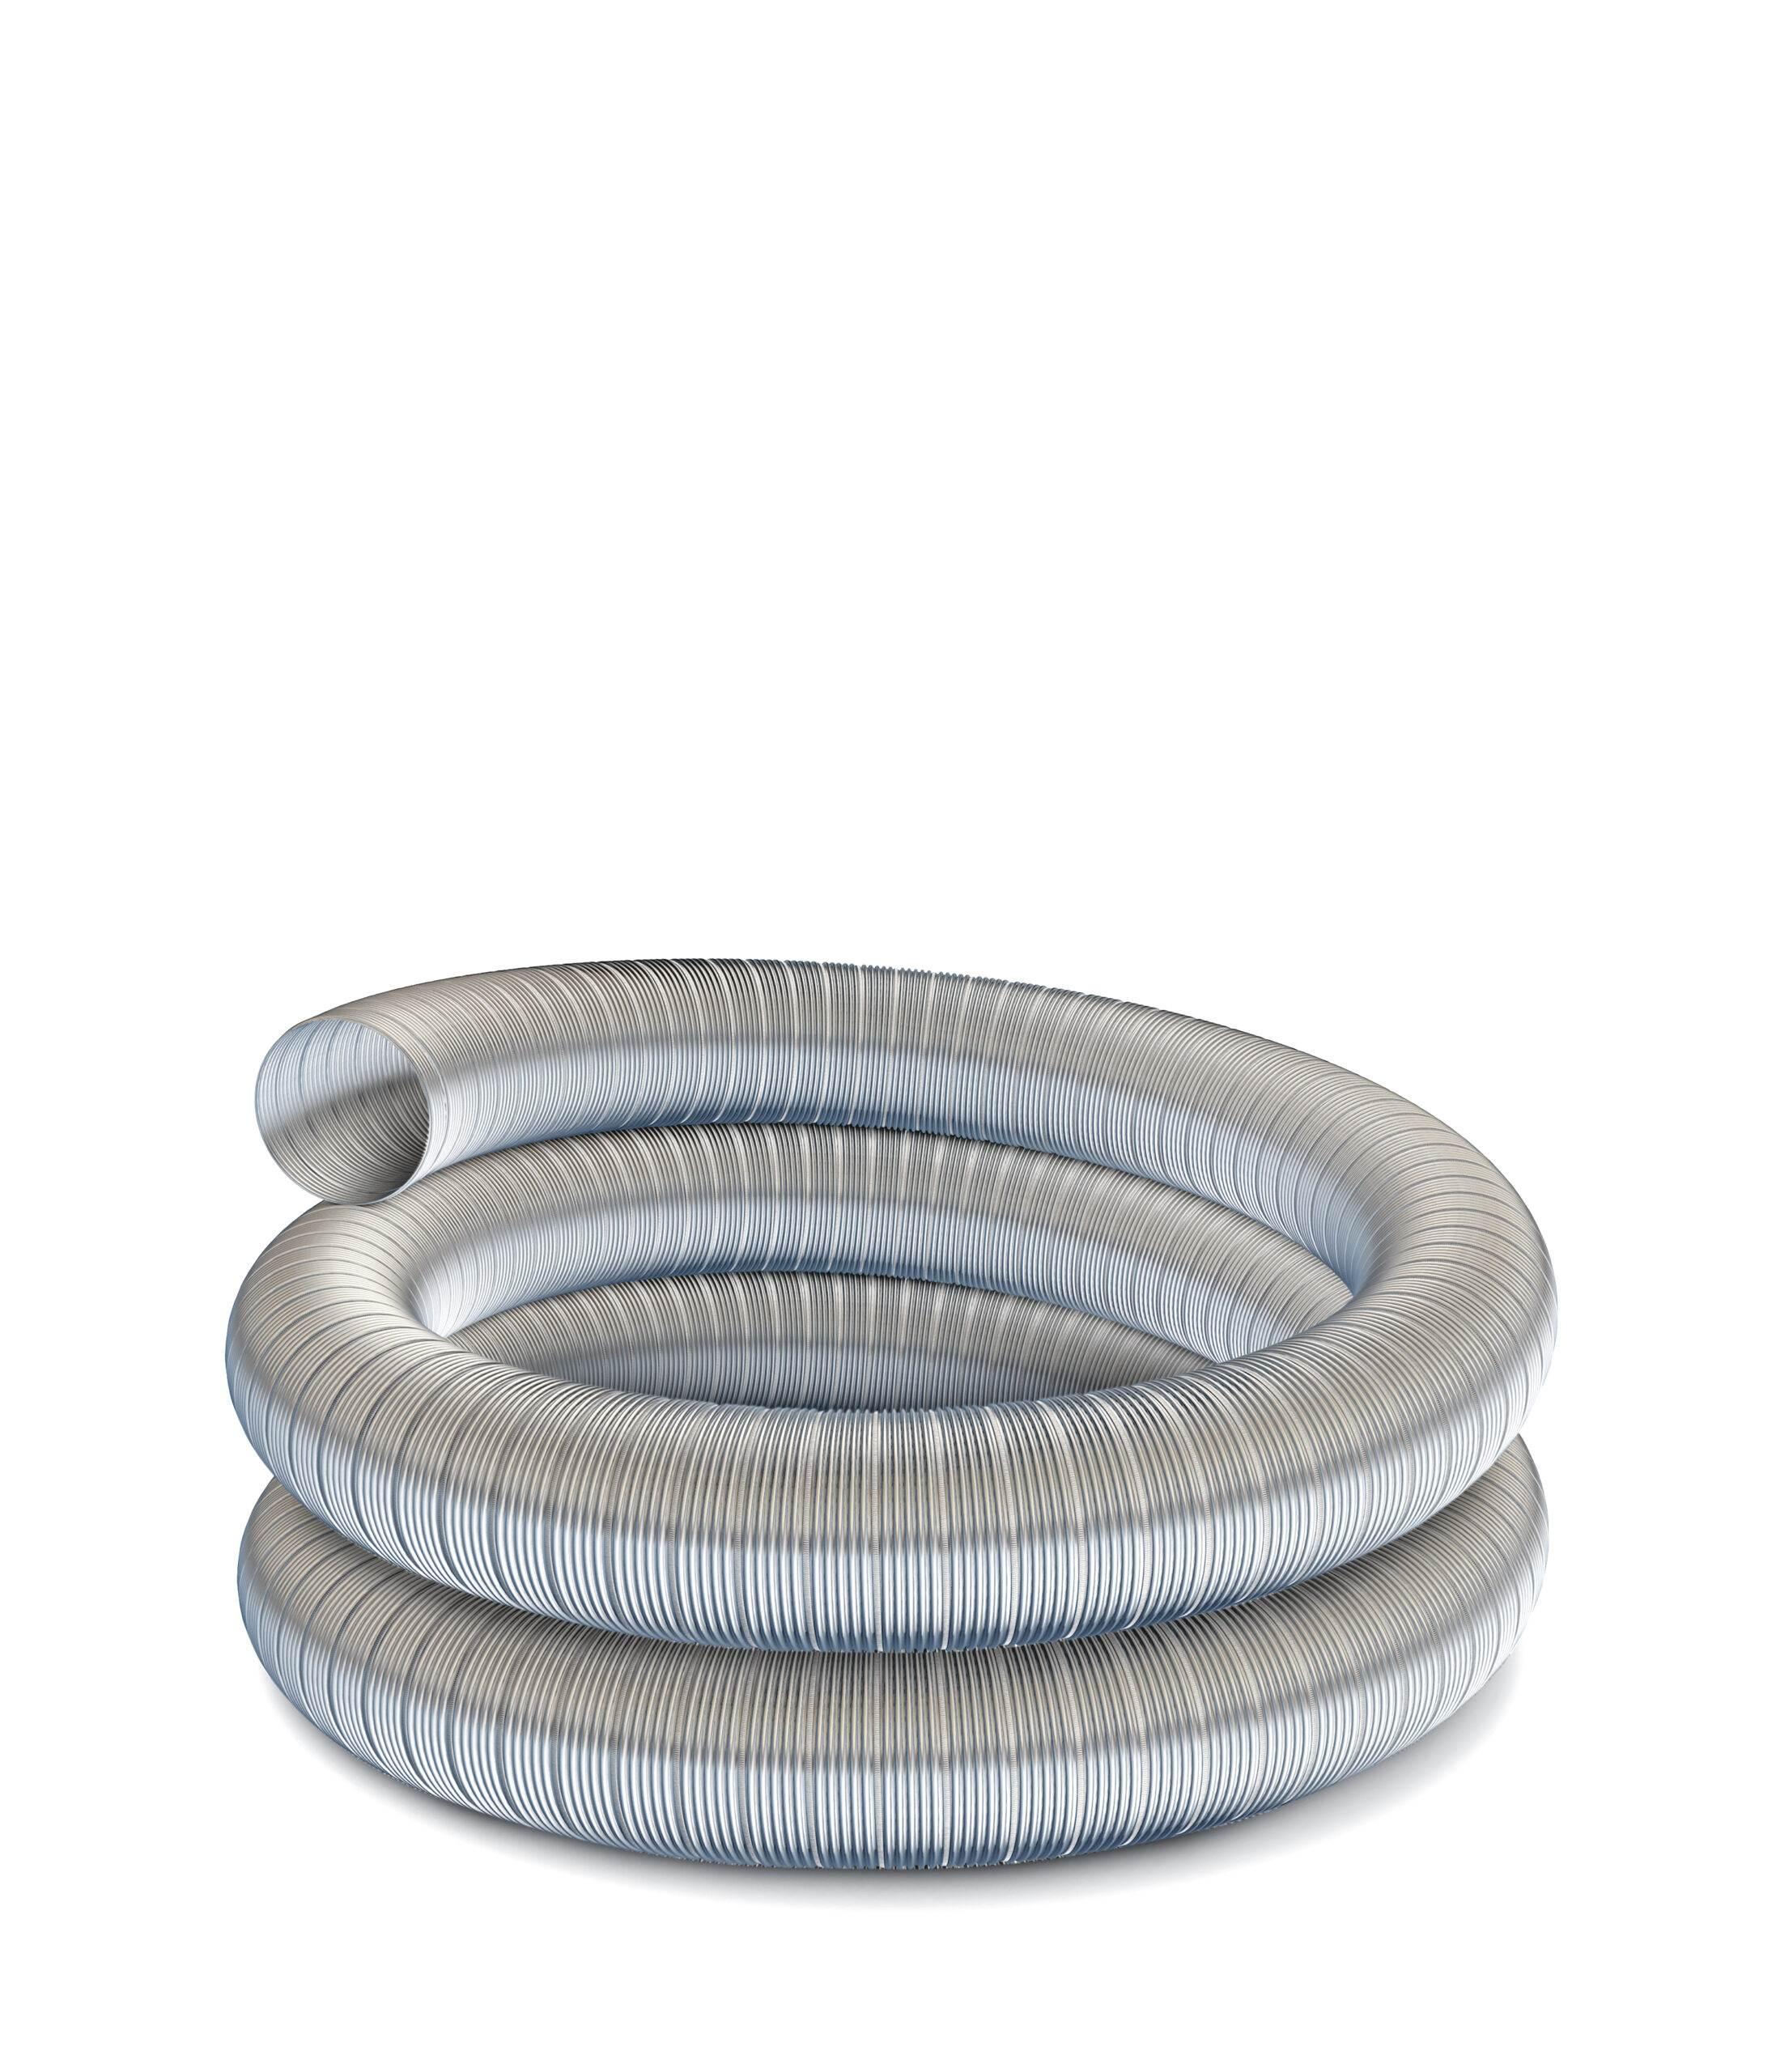 "Technoflex Flexible Flue Liner - 6m Length - 125mm (5"") Diameter - 316 grade"